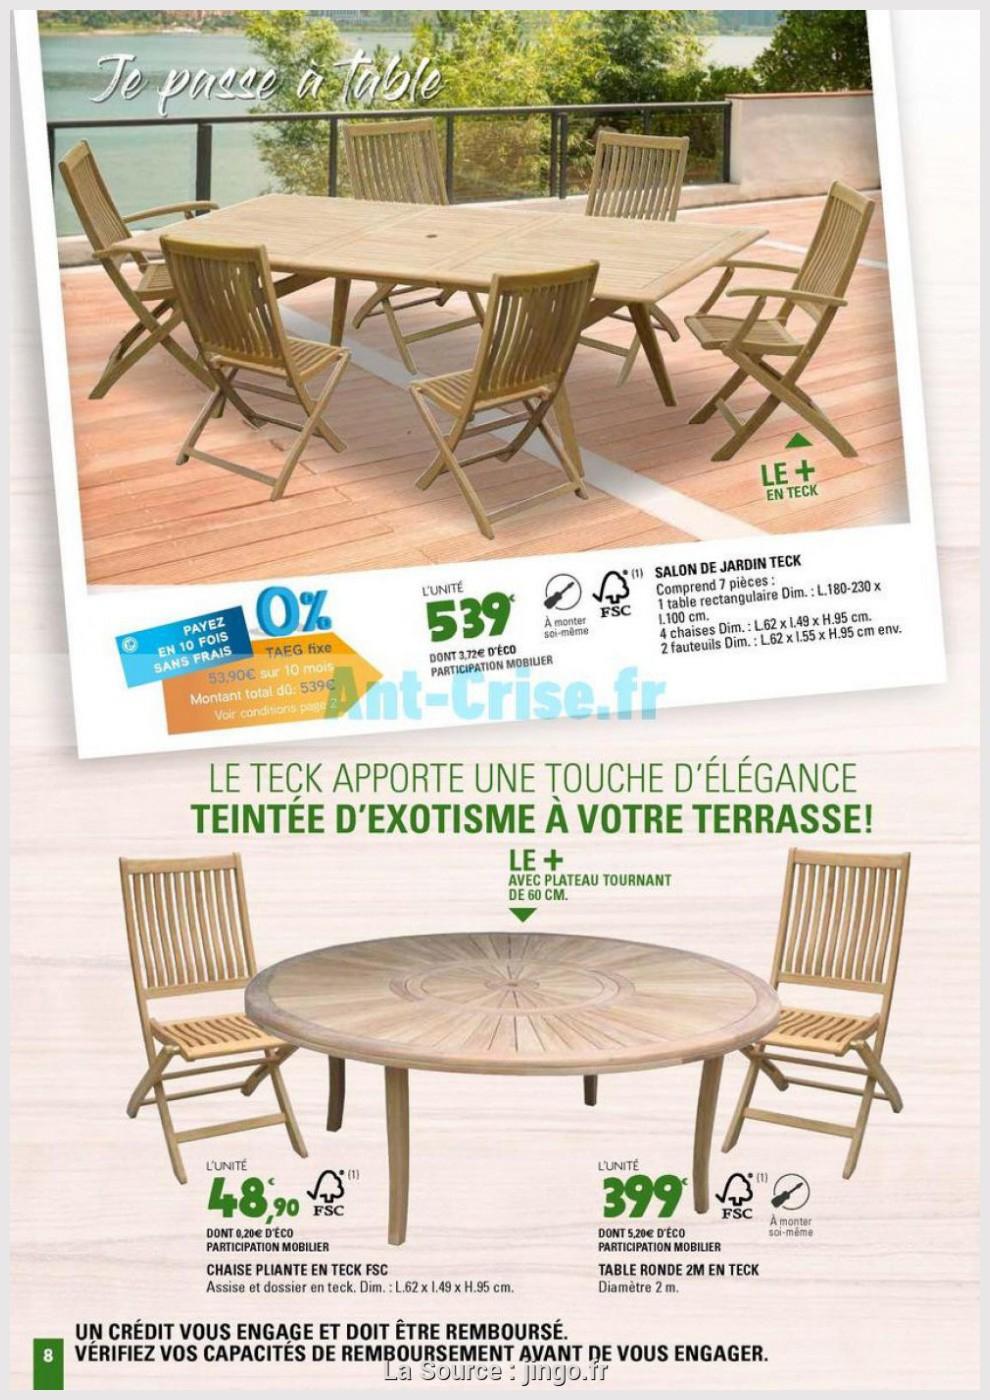 Jardin Belle Teck De Leclerc 2M 8 Table Ronde Sjzplugqmv tout Leclerc Mobilier De Jardin